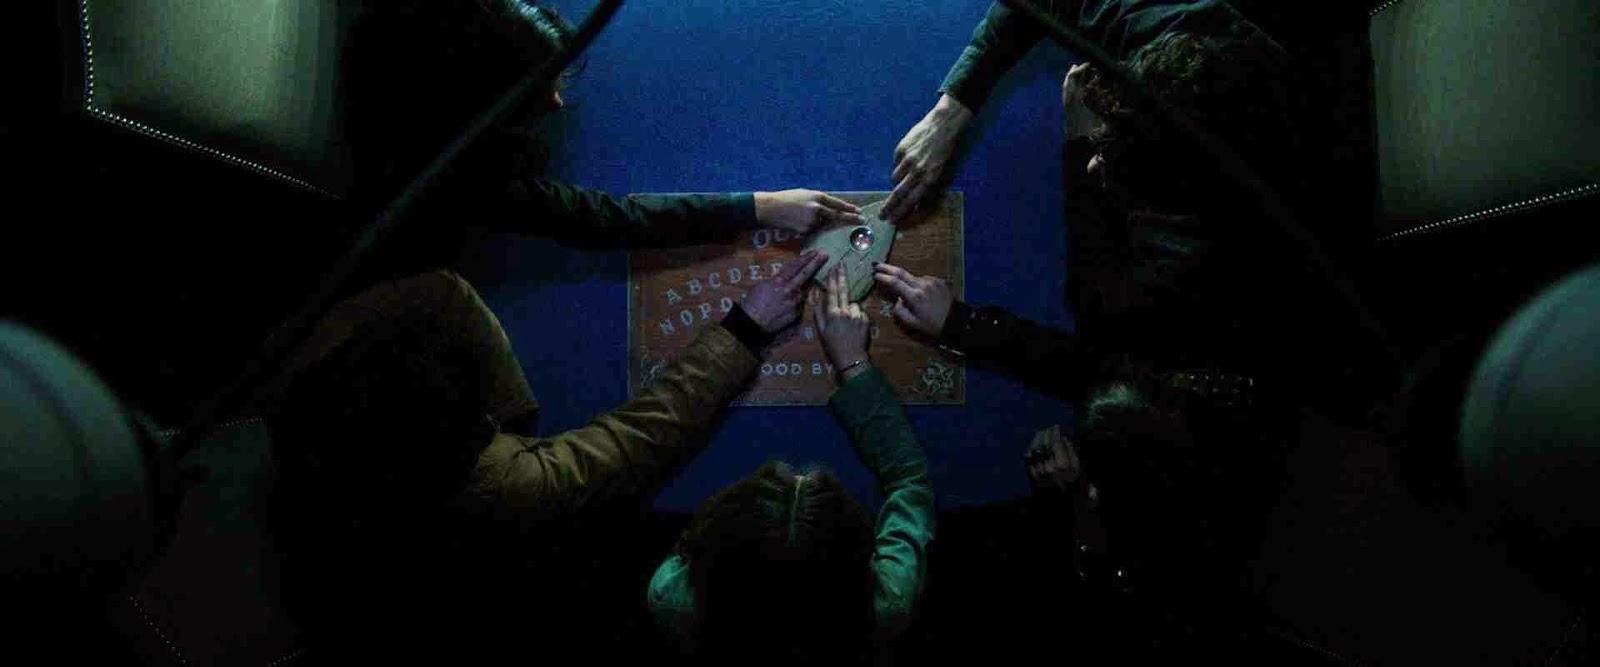 Hollywood movies 2014 dual audio eng hindi - Film noir death scene